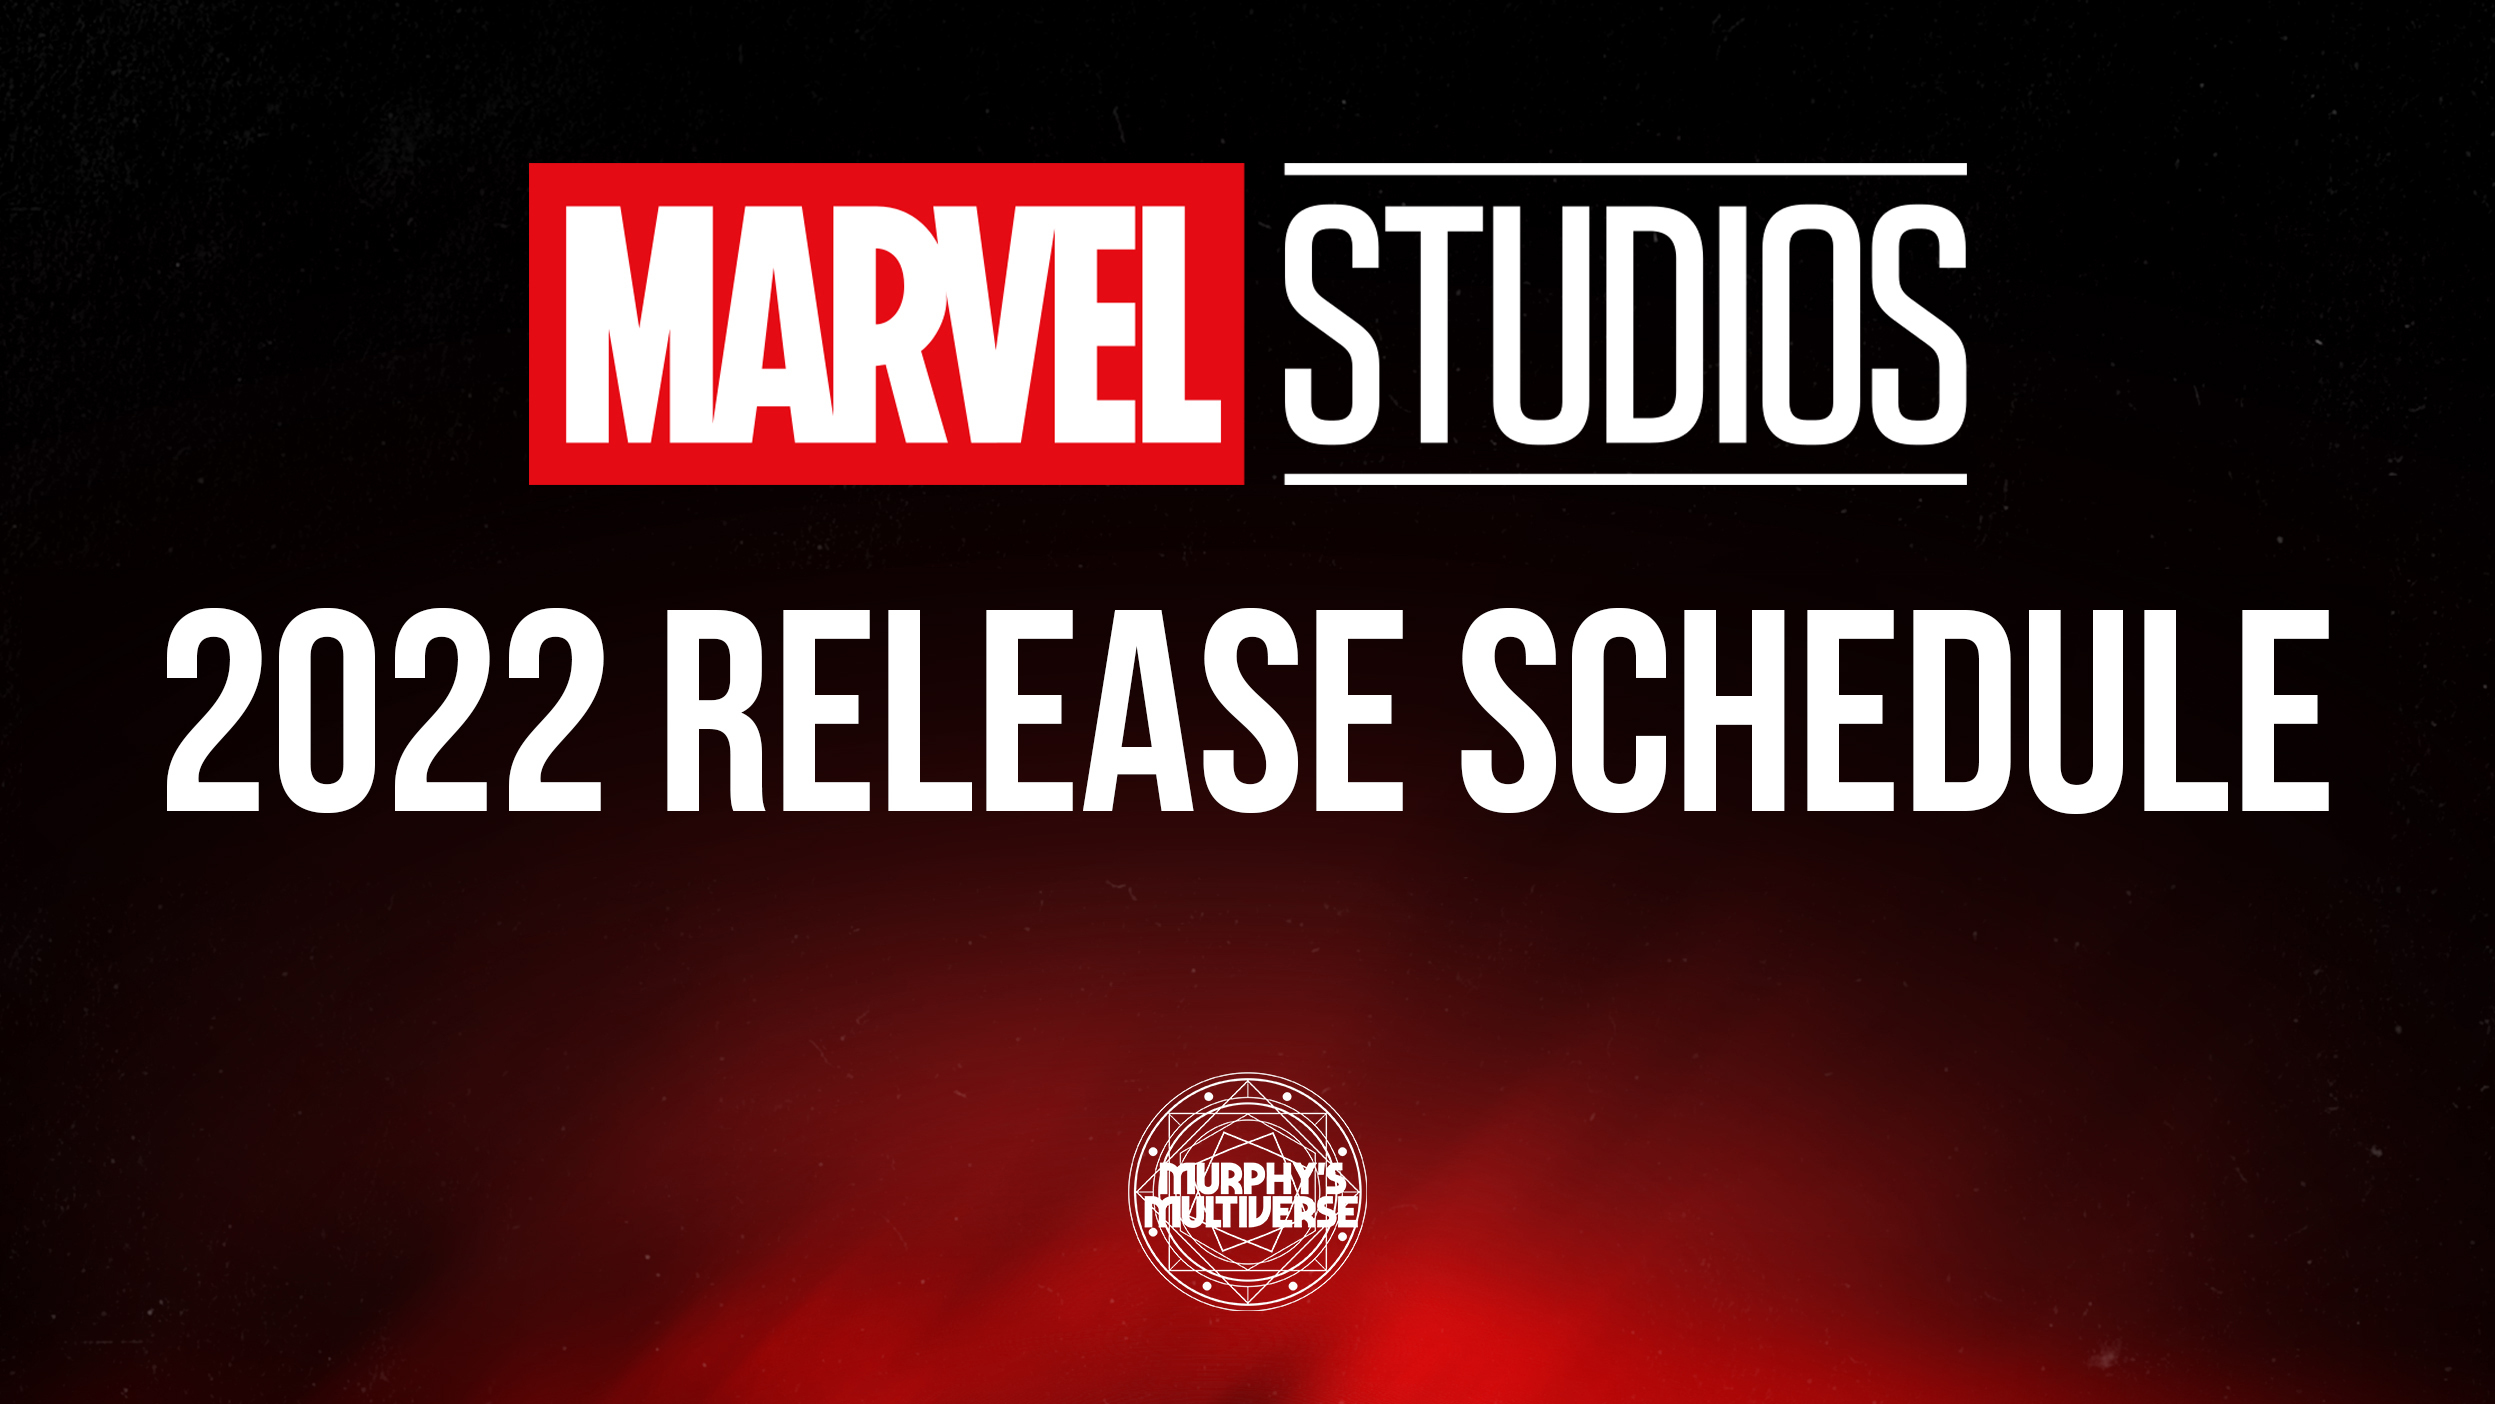 2022 Rut Calendar.Deep Thoughts One Hypothetical Marvel Studios 2022 Release Calendar Murphy S Multiverse